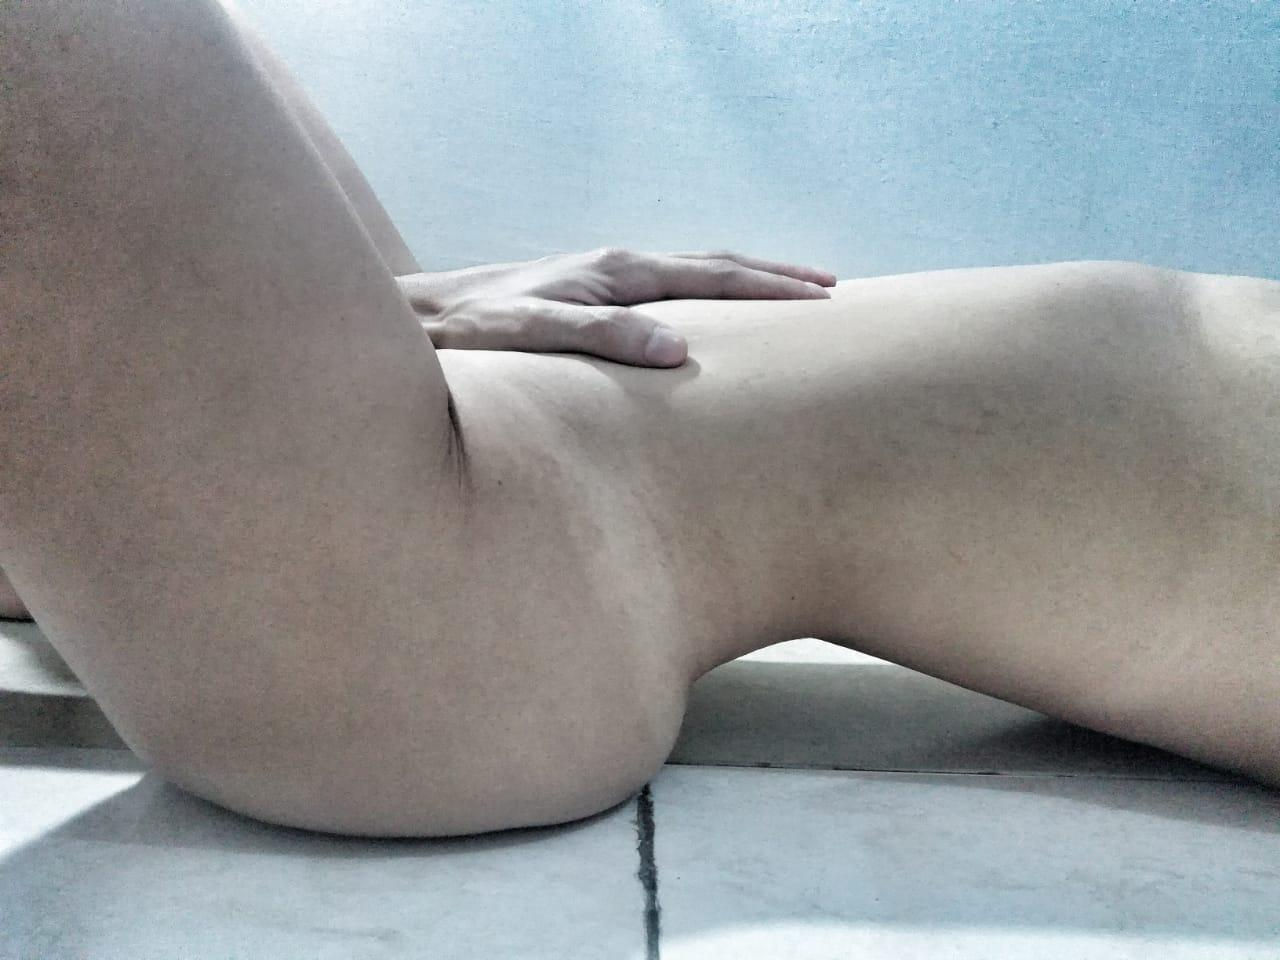 Sex horny?s=tubvv7cnn27otocyynijkzzzblgoojogqzxvkfcpnx8=